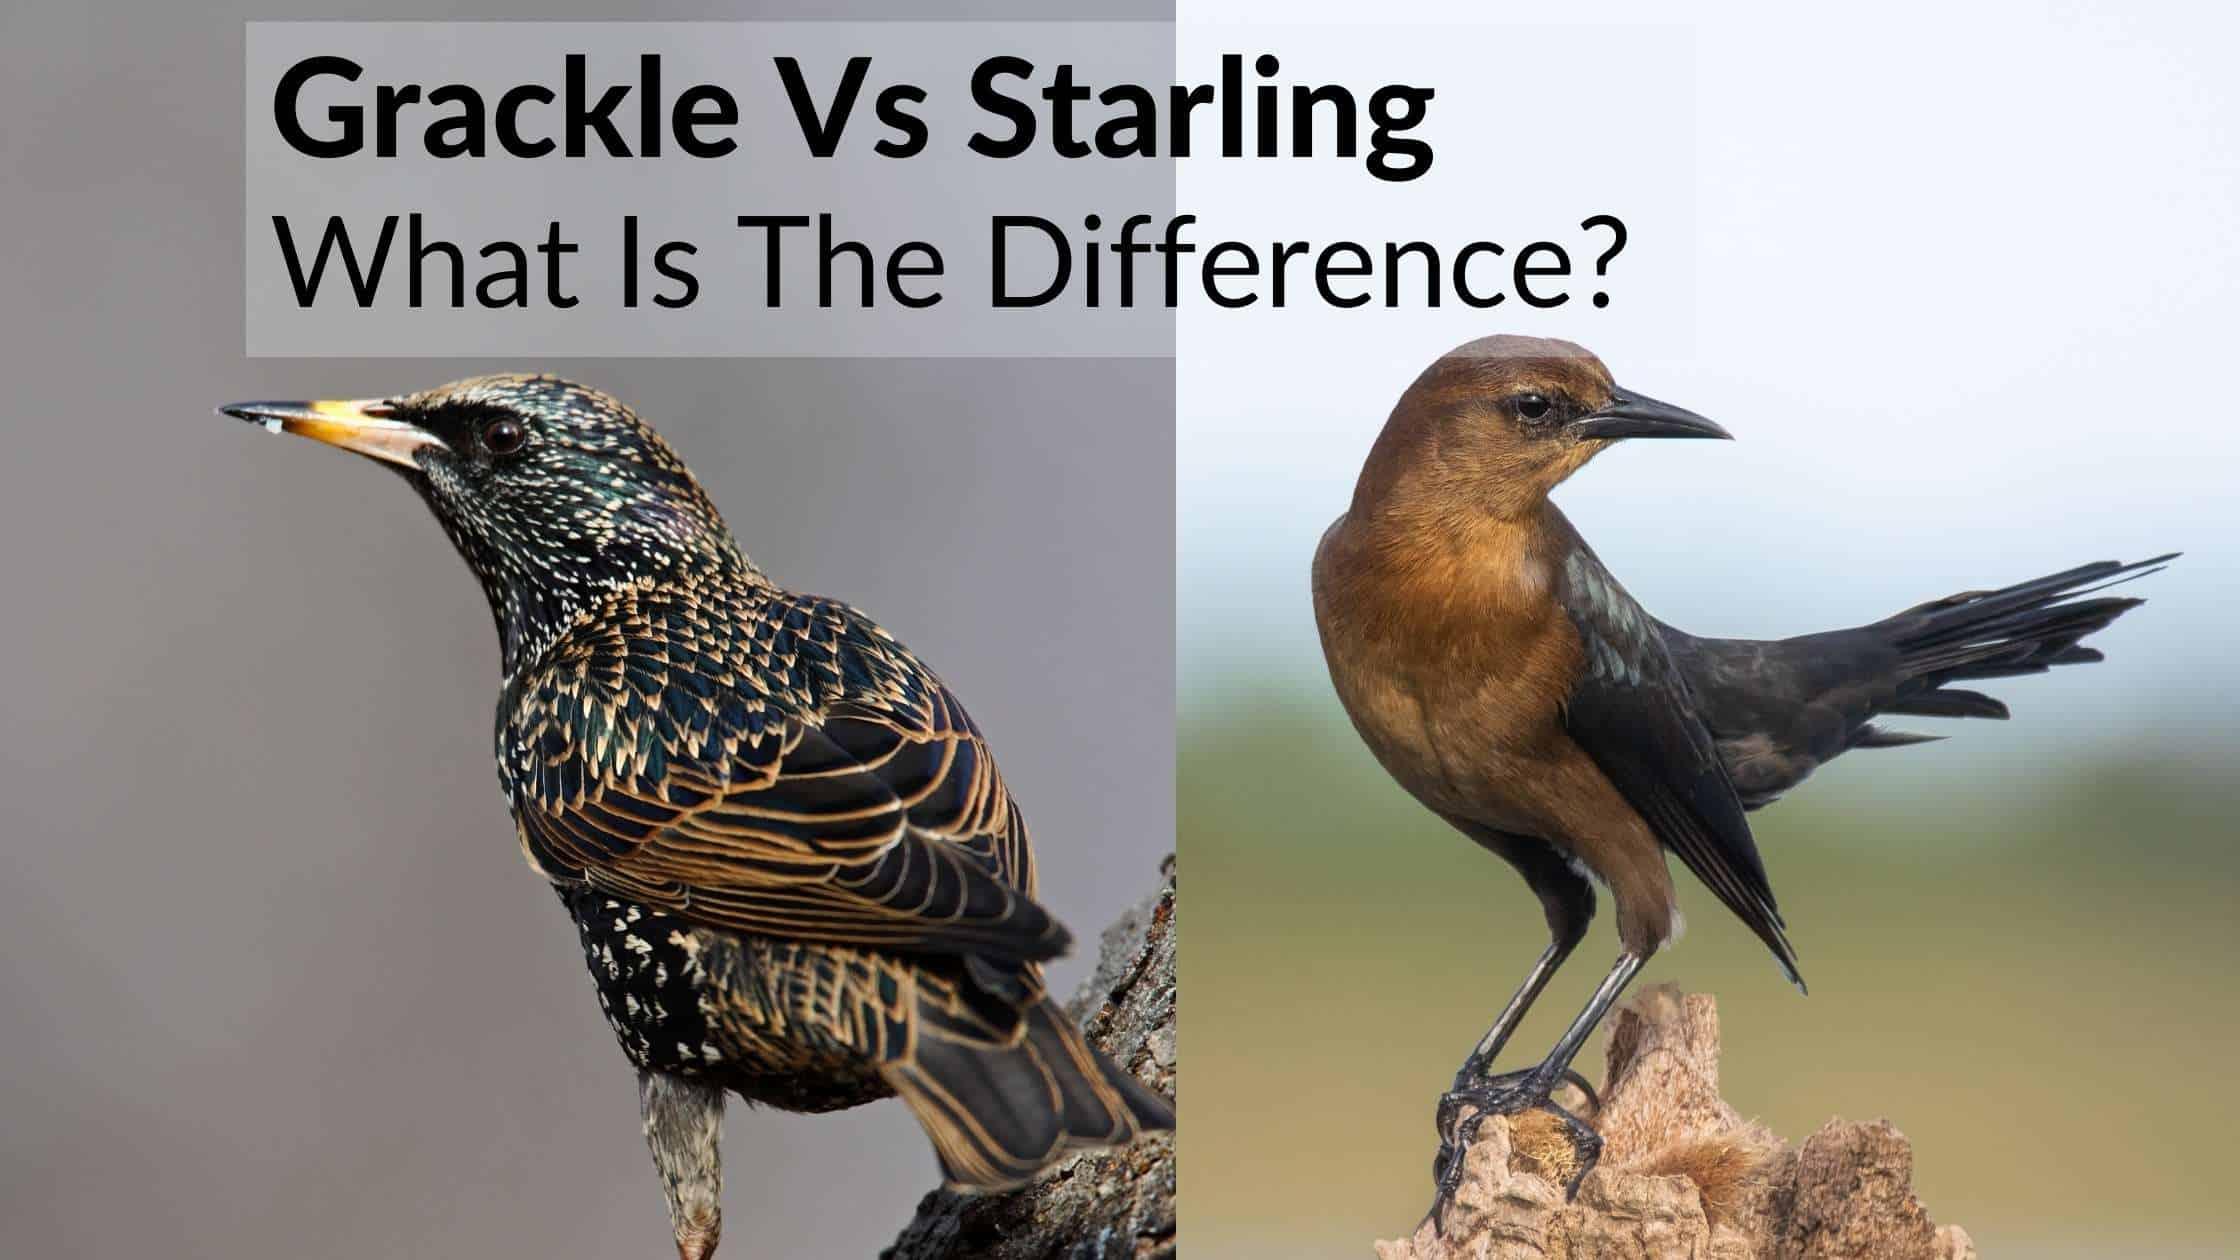 Grackle Vs Starling